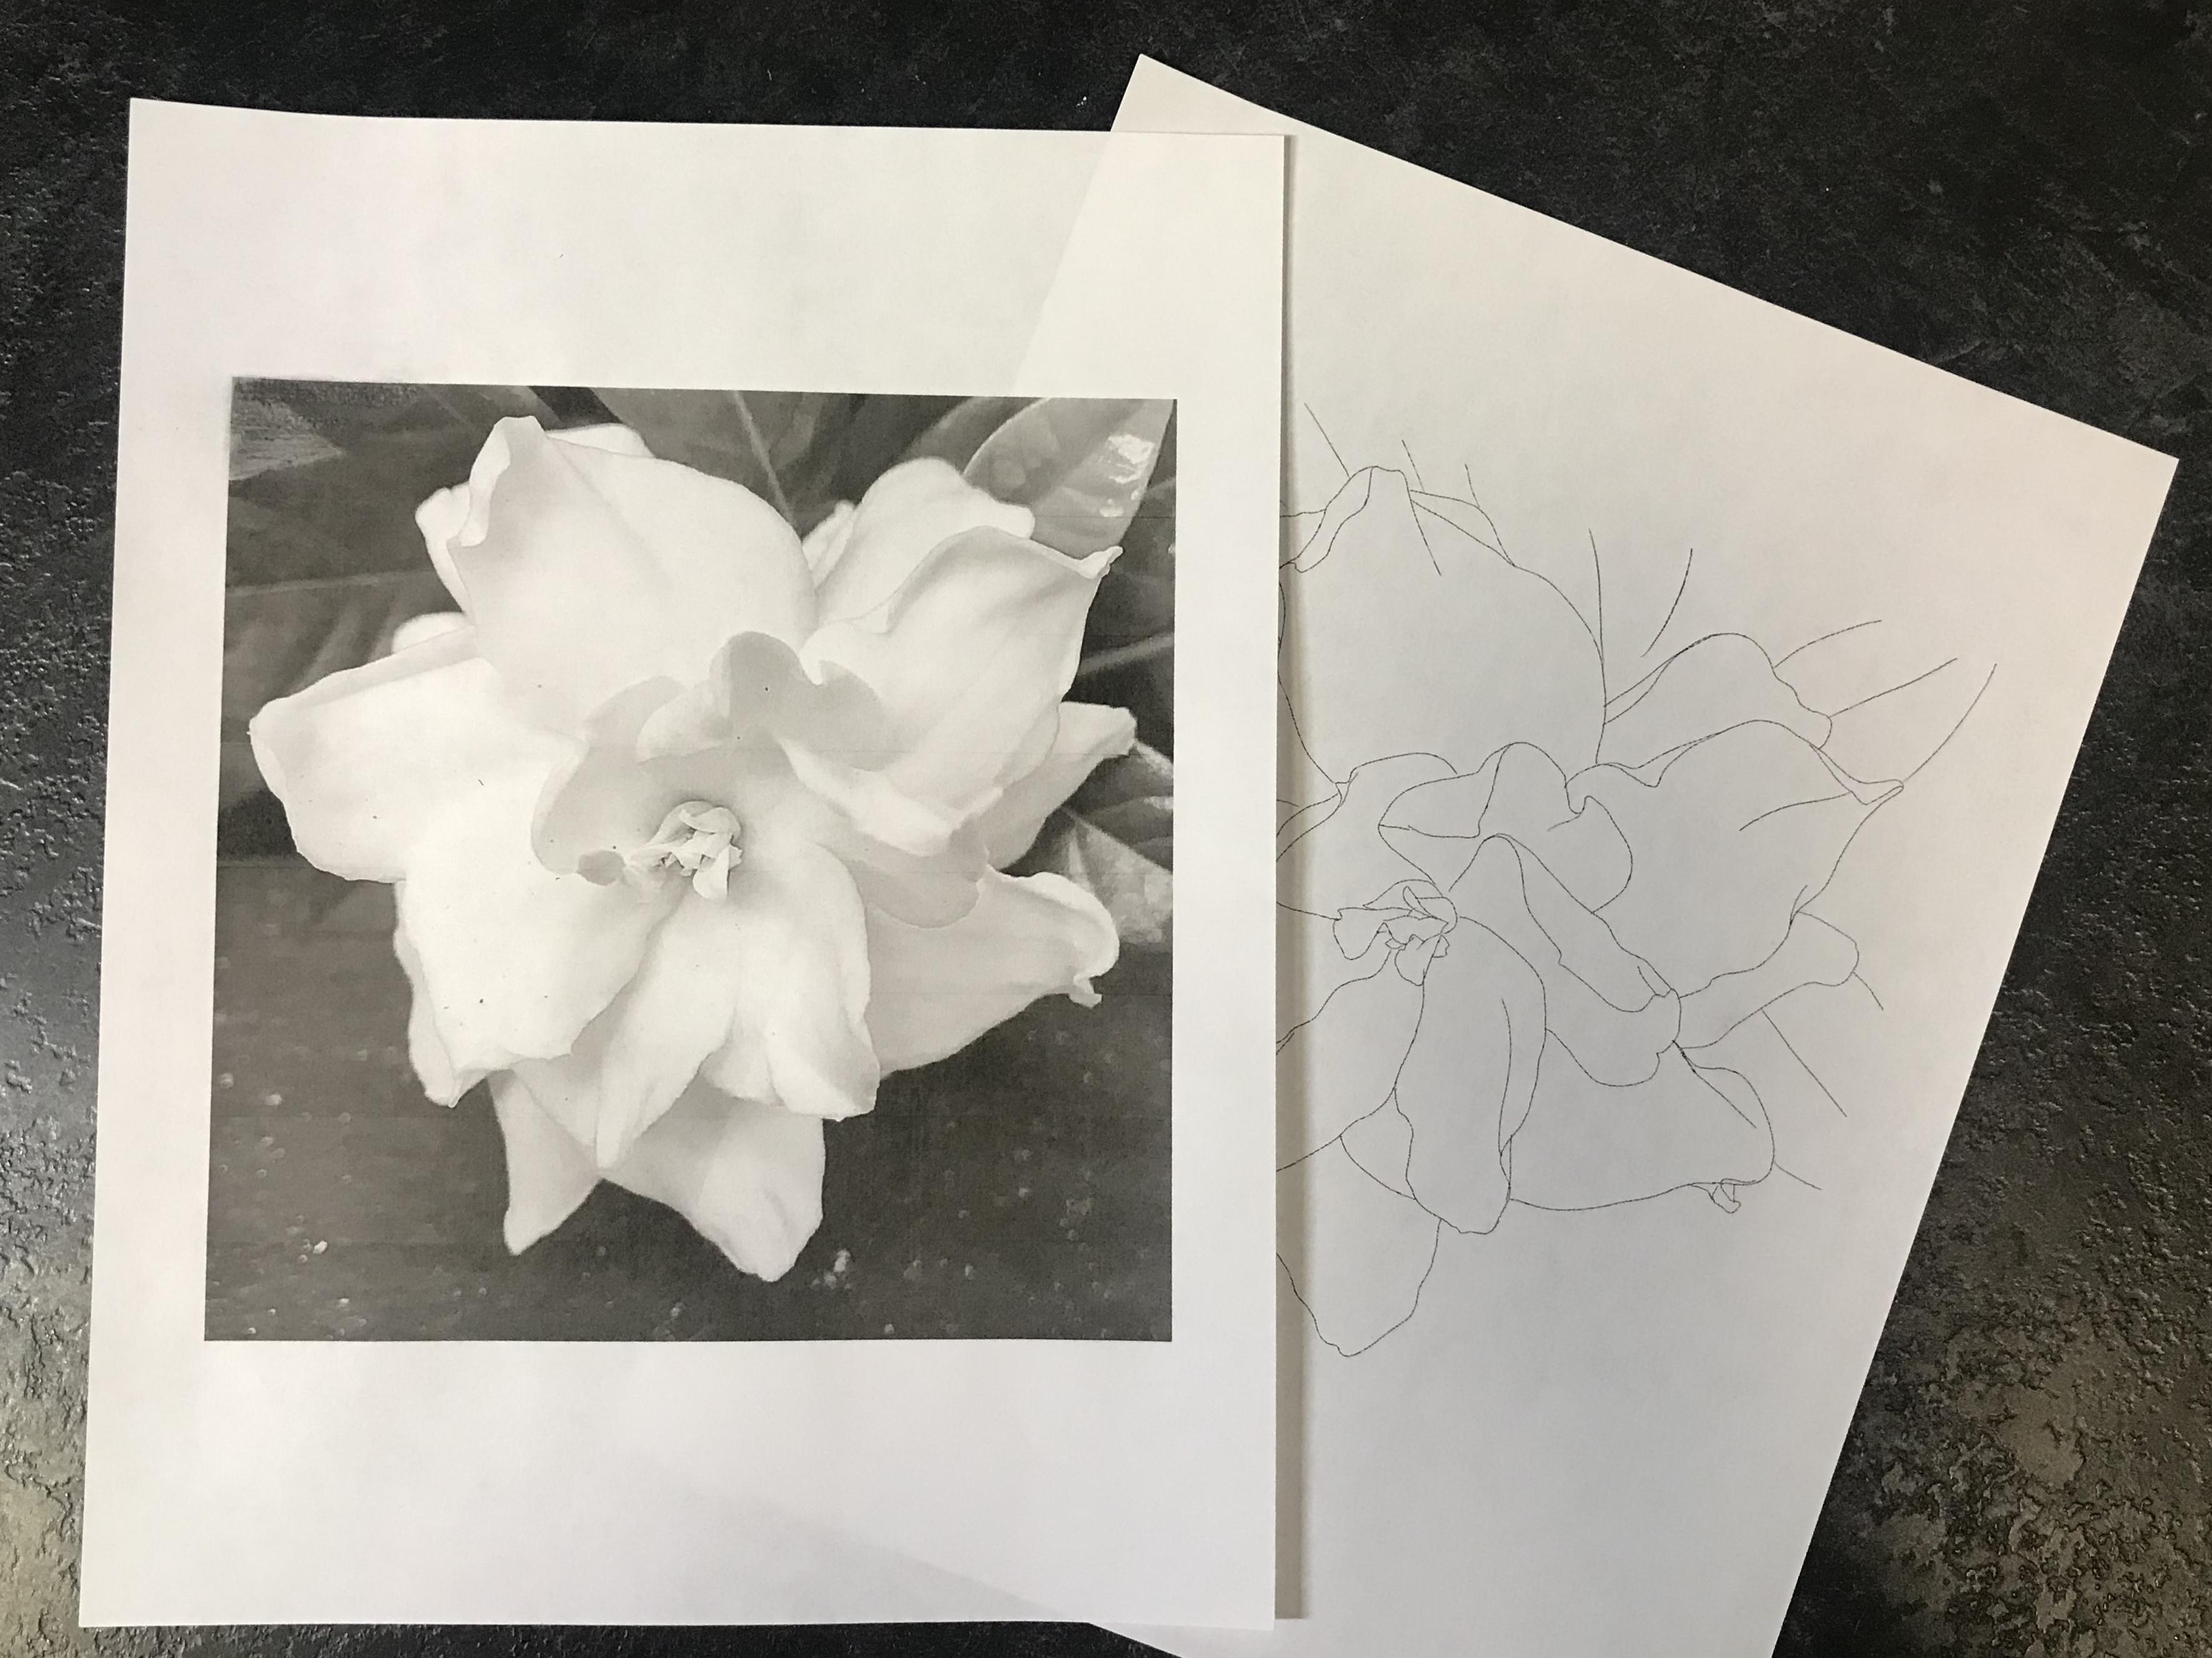 lallen_tattoo - Gardenia 3